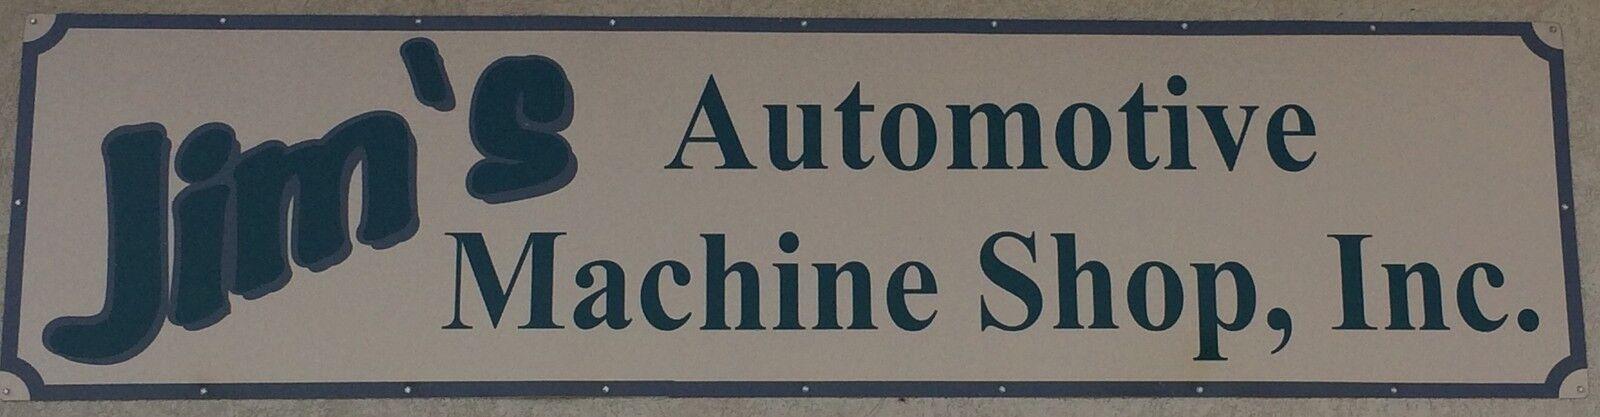 Jim's_Automotive_Machine